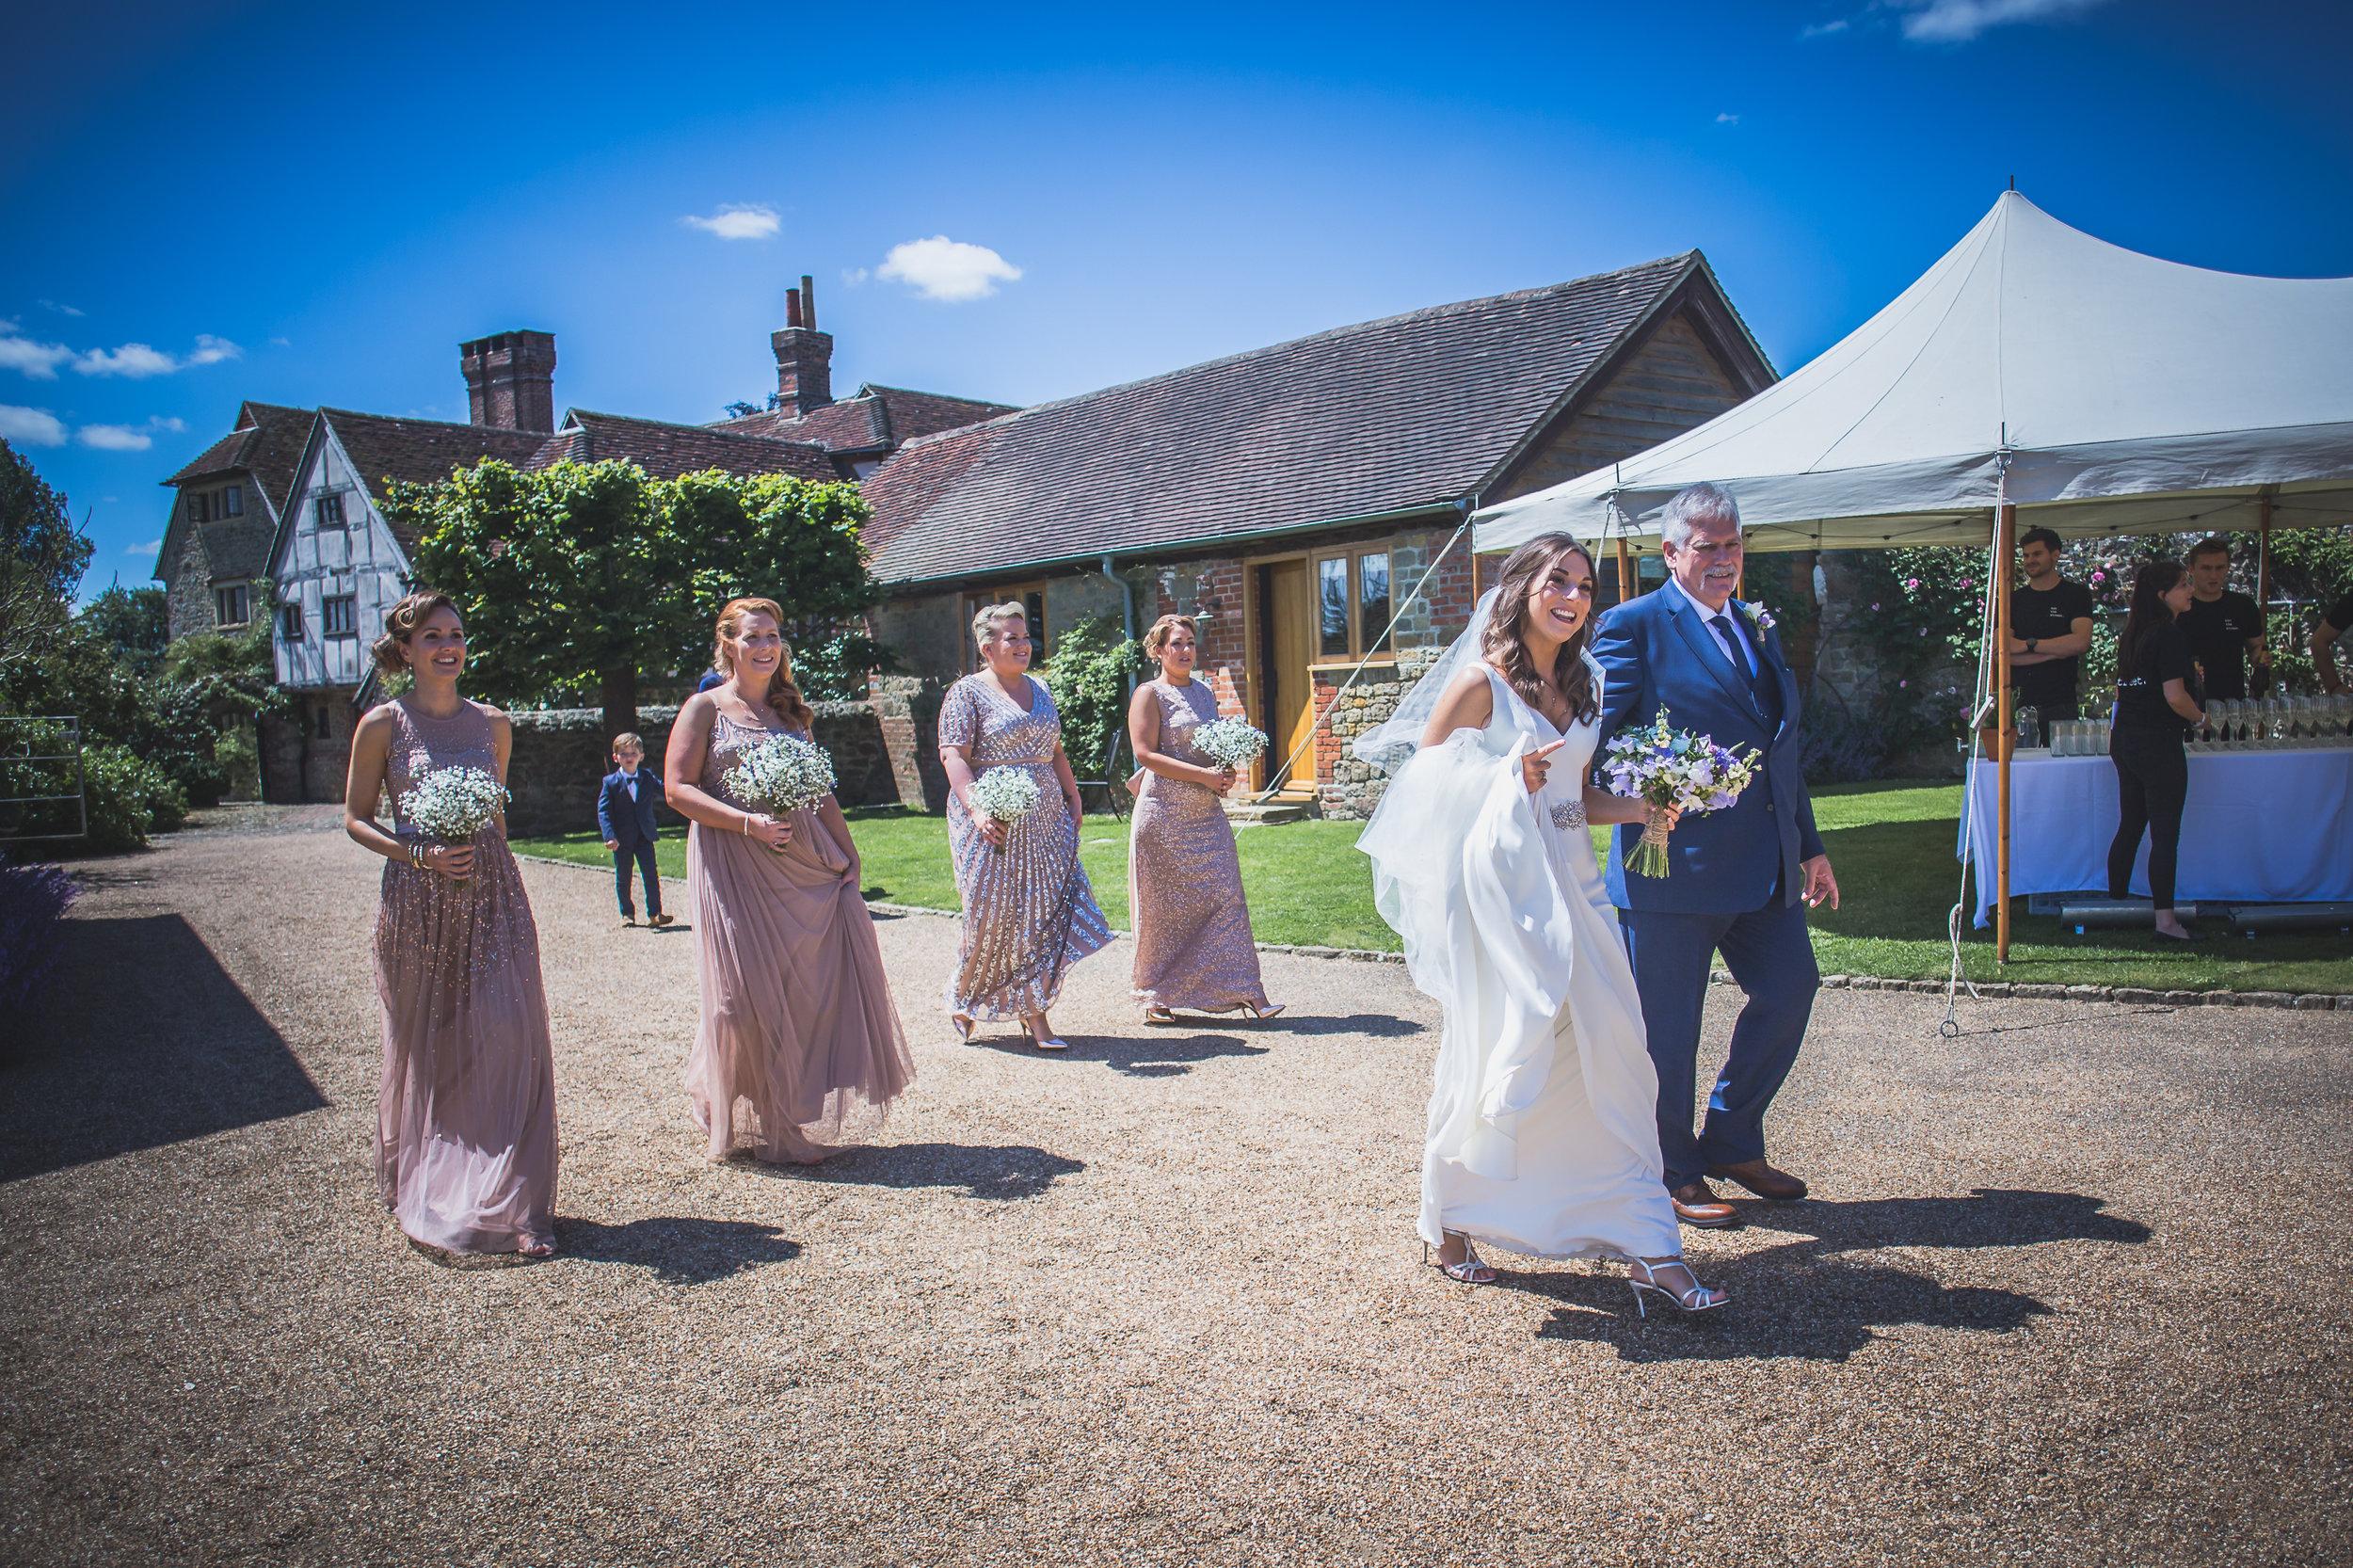 Grittenham Barn female wedding photographers west sussex petworth social-47.jpg